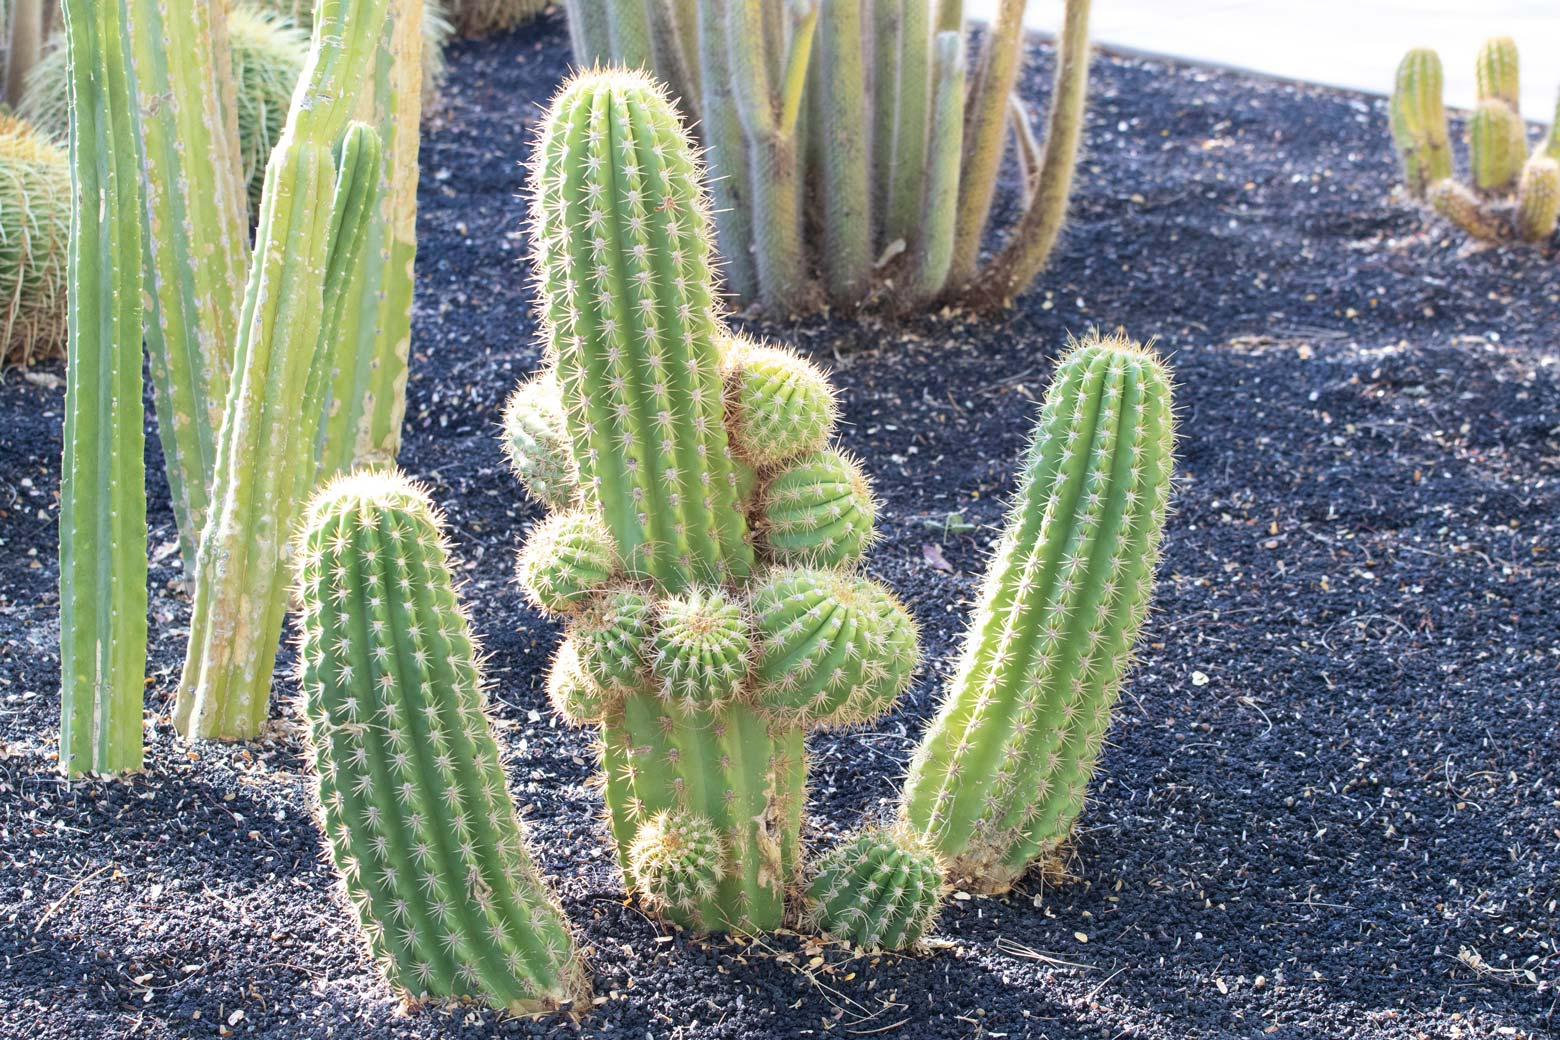 A larger Torch Cactus specimen in the specimen bed.